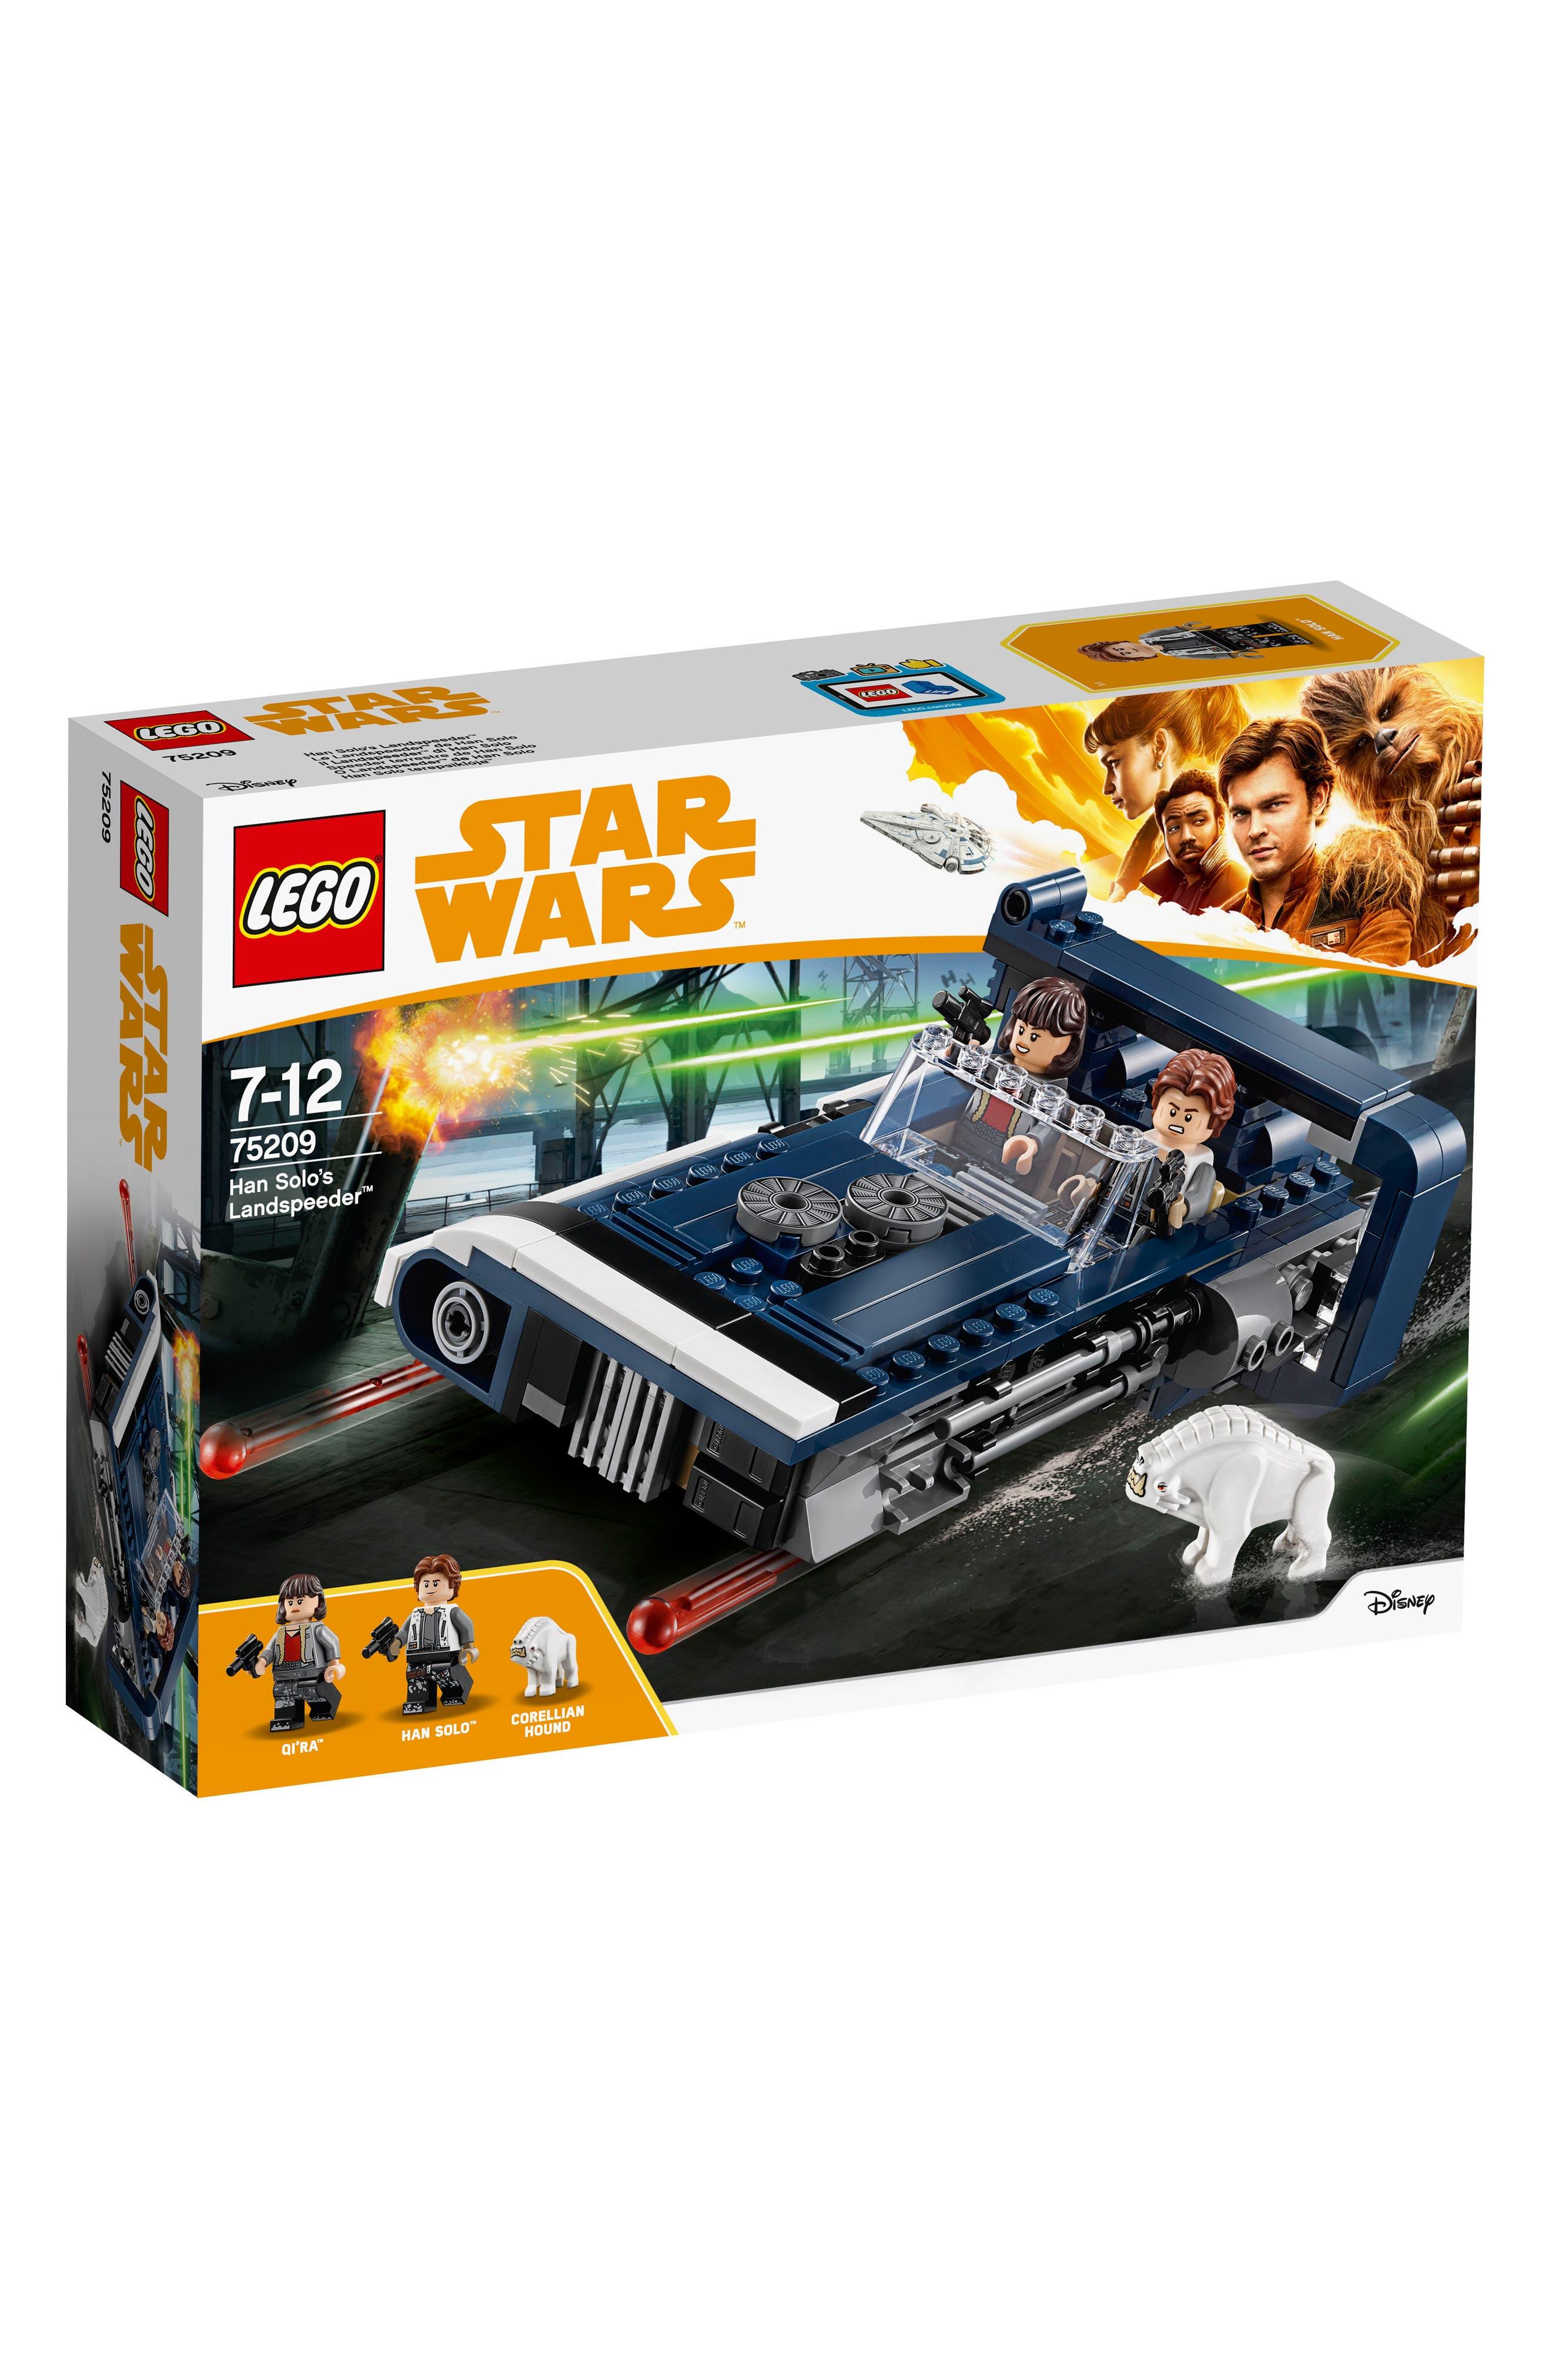 Star Wars<sup>®</sup> Han Solo's Landspeeder<sup>™</sup> - 75209,                         Main,                         color, Multi